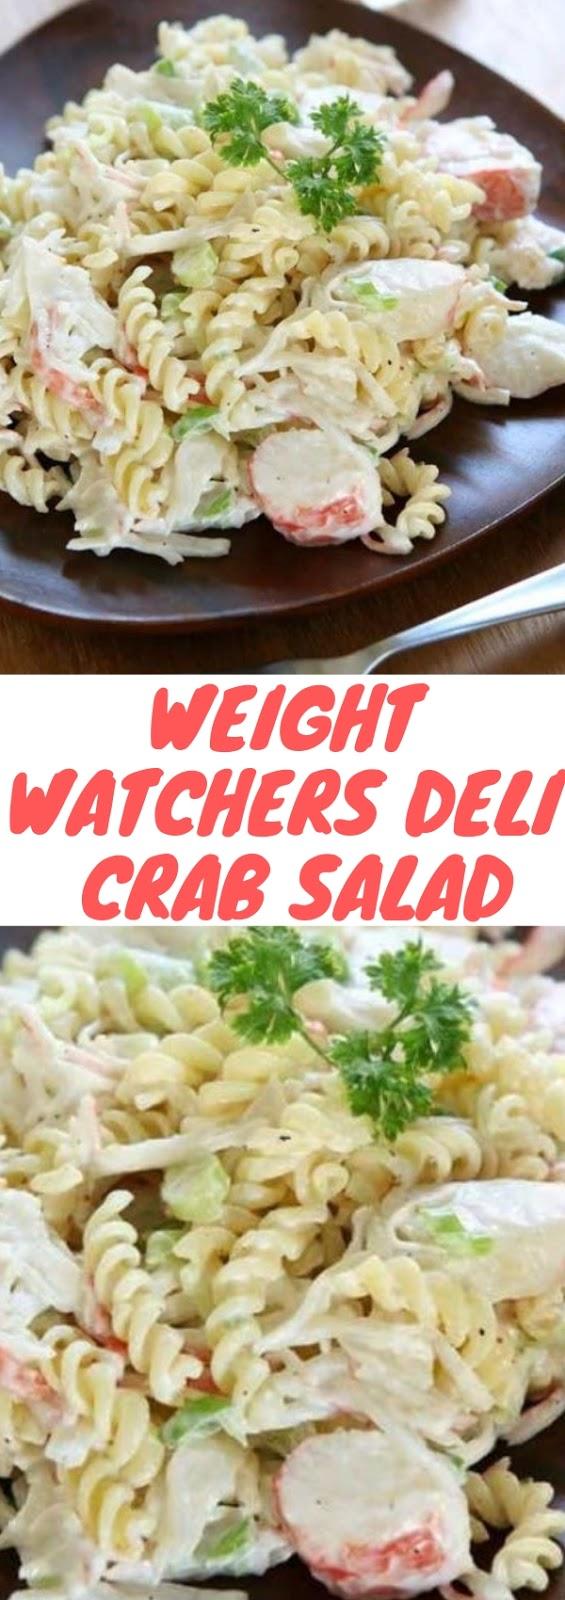 Weight Watchers Deli Crab Salad  #lunch #weightwatchers #deli #crab #salad #healthy #dietfood